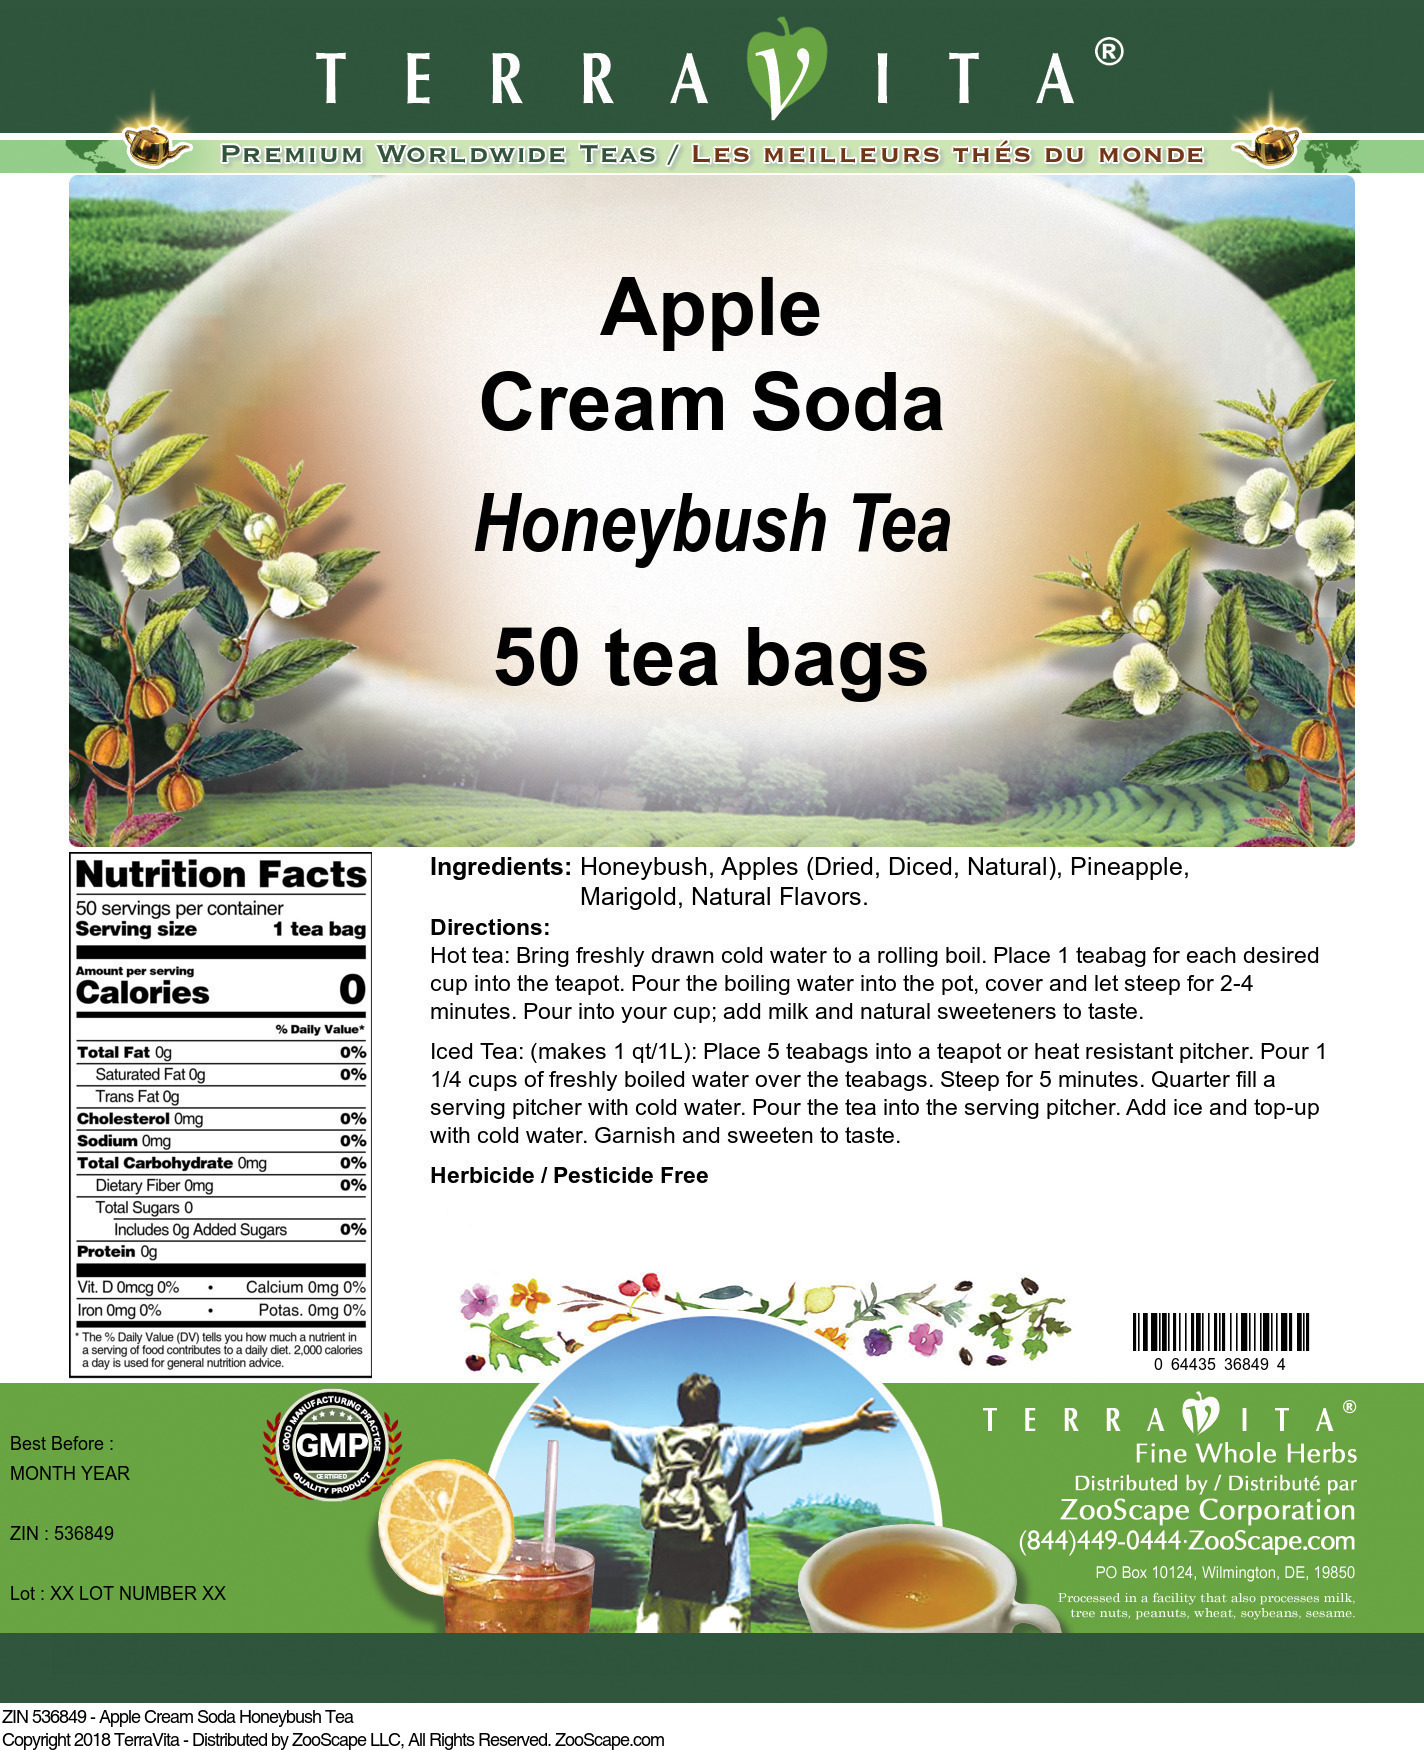 Apple Cream Soda Honeybush Tea